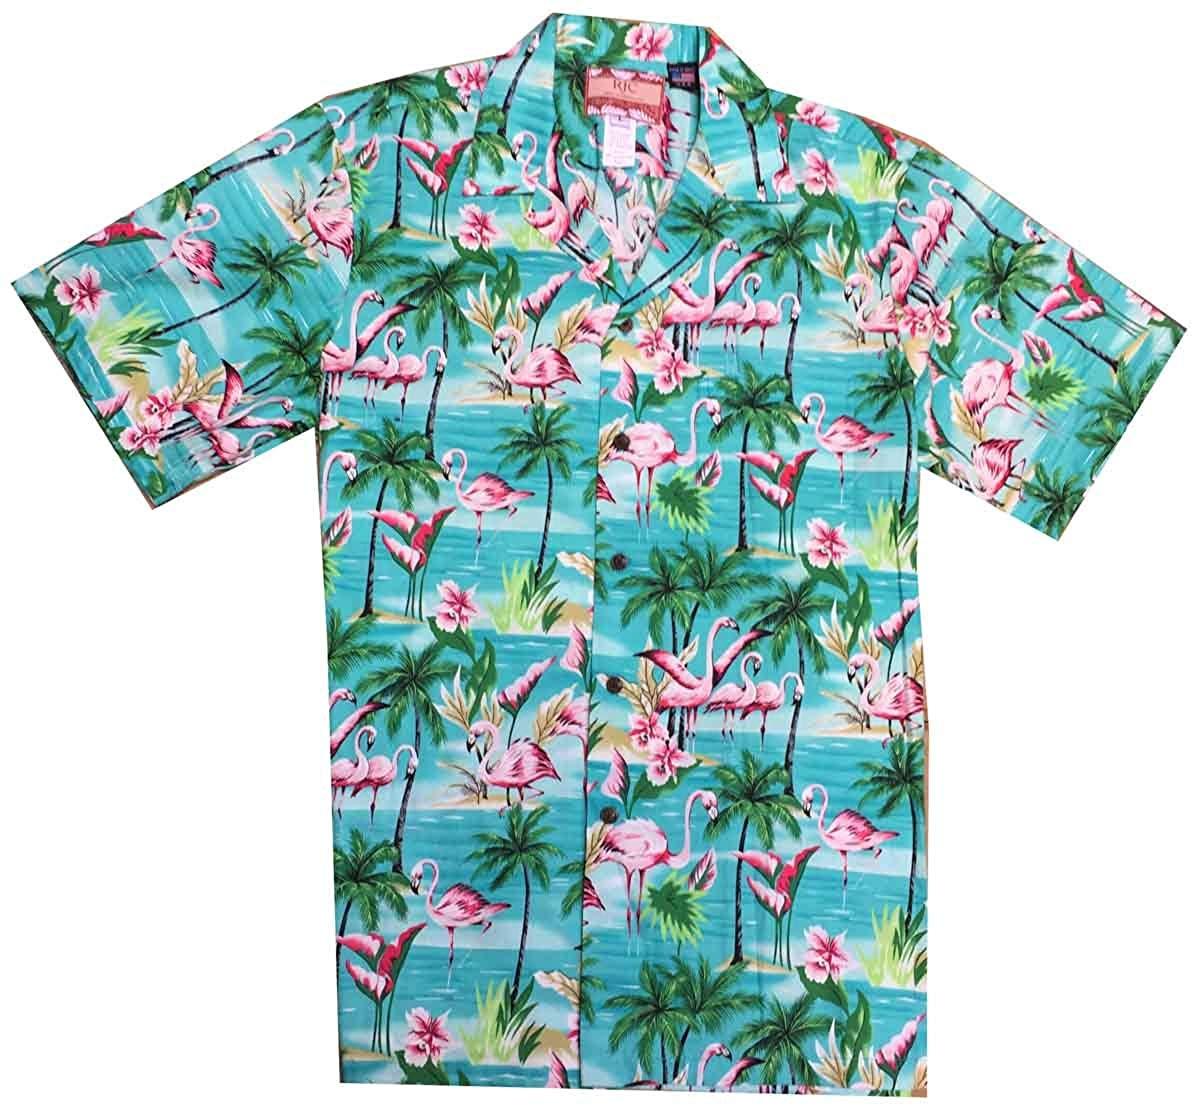 ea60057f8 Cheap Hawaiian Shirt Company, find Hawaiian Shirt Company deals on ...